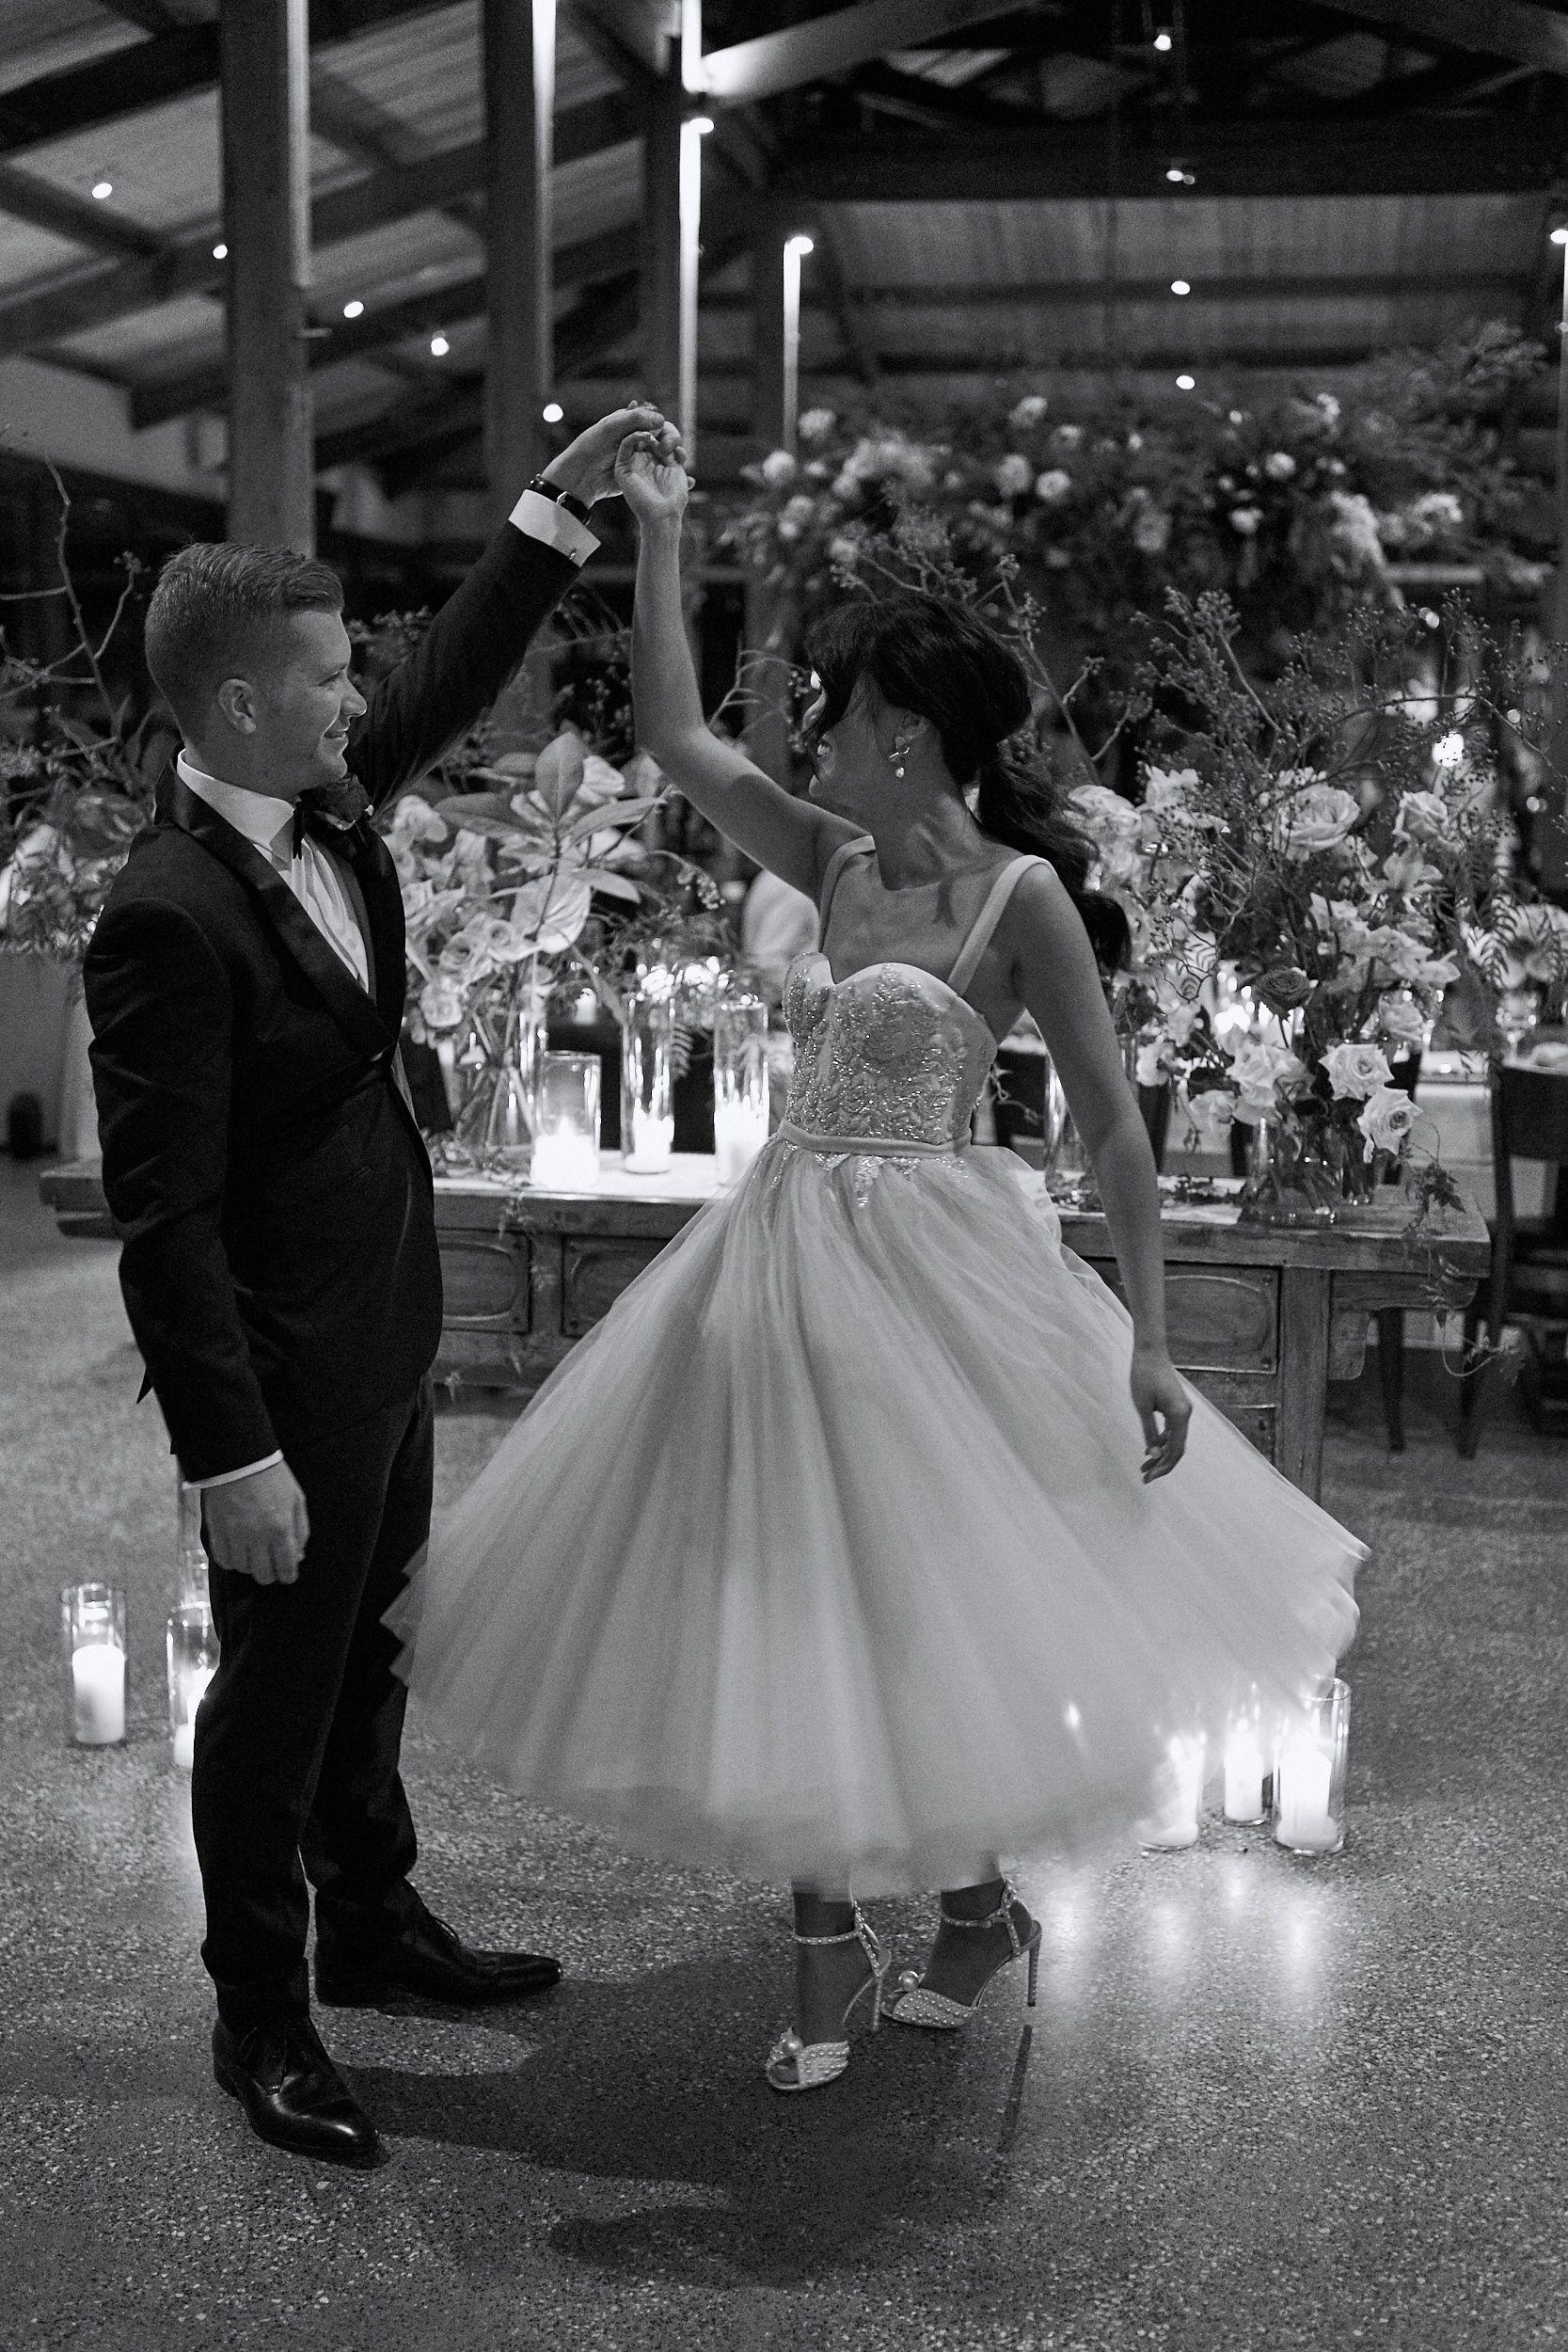 A D Gorgeous Wedding Dress Destination Wedding Photography Wedding Reception Dress